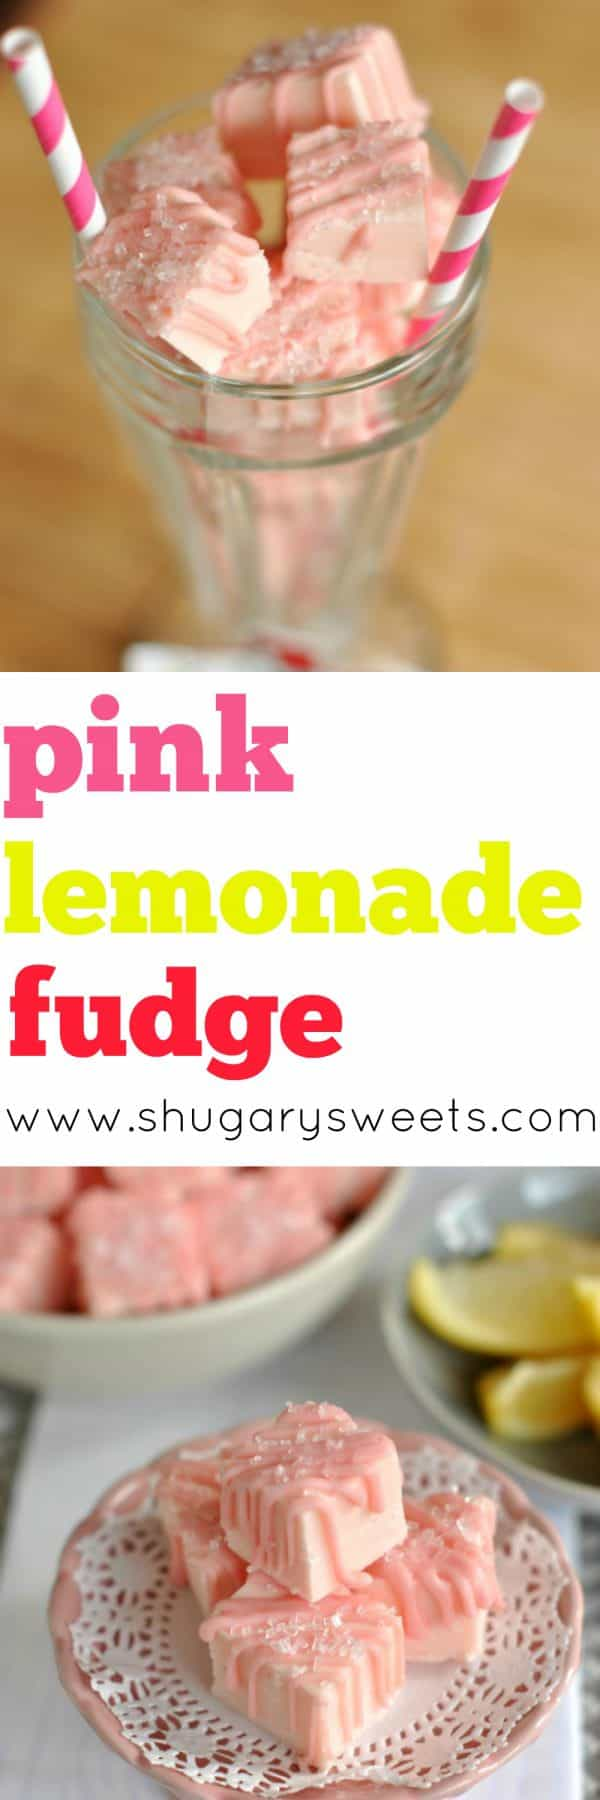 Pink Lemonade Fudge, a sweet treat!!